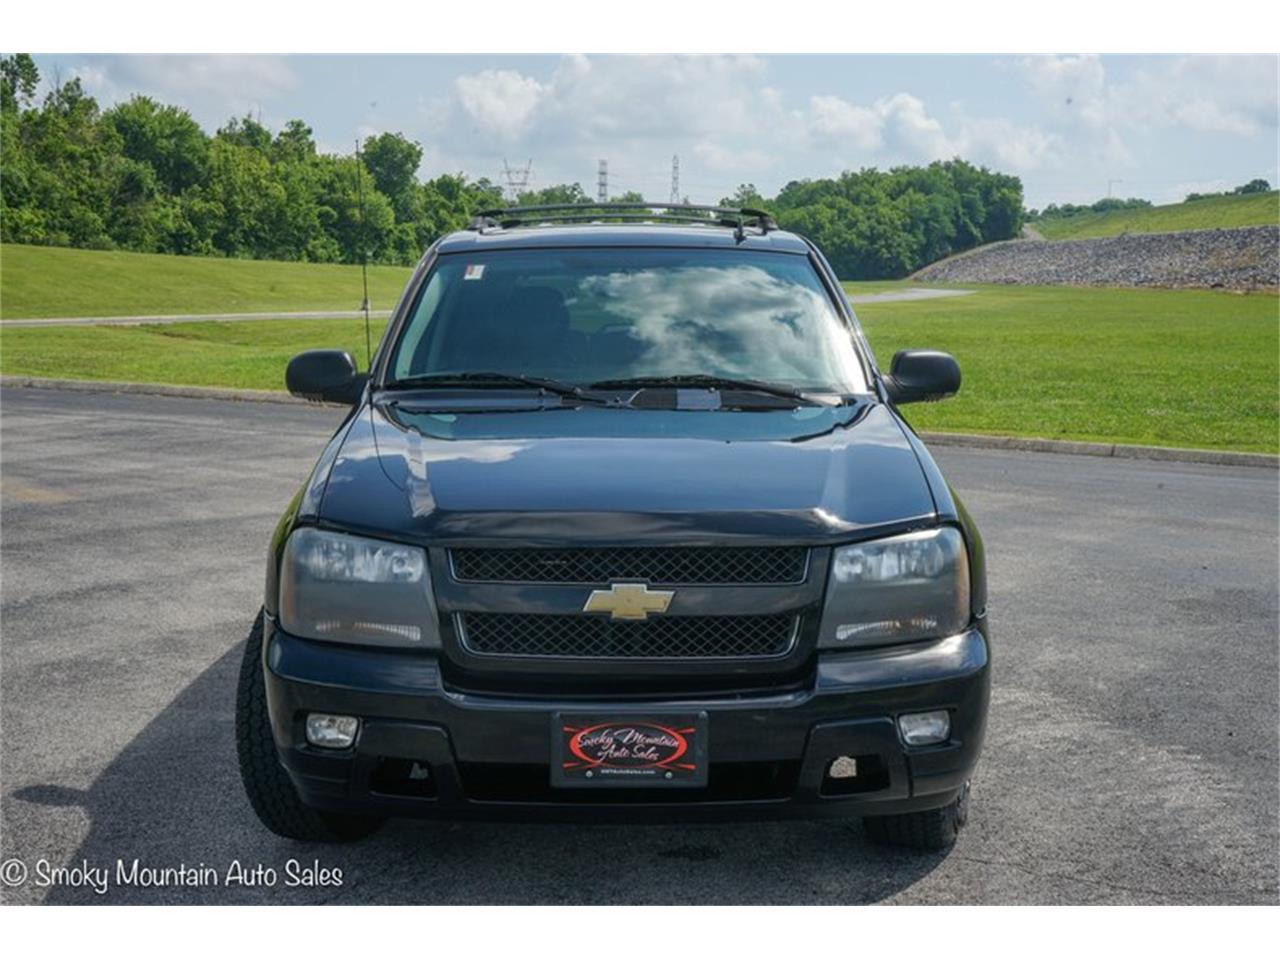 2007 Chevrolet Trailblazer (CC-1361066) for sale in Lenoir City, Tennessee